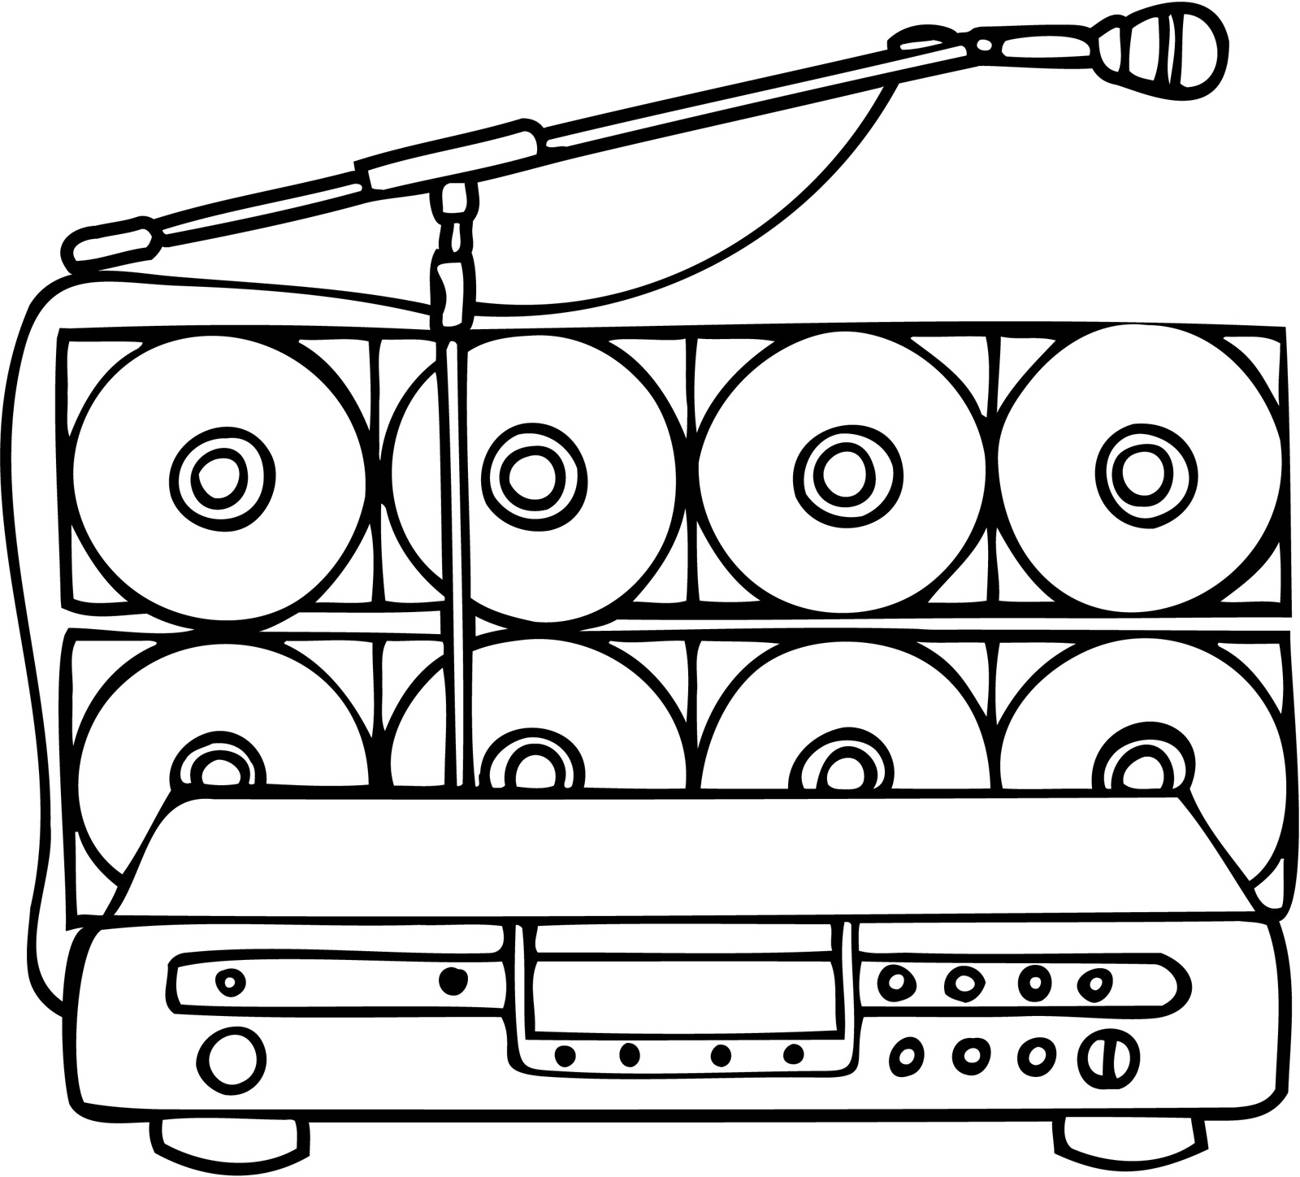 MUSIC-095